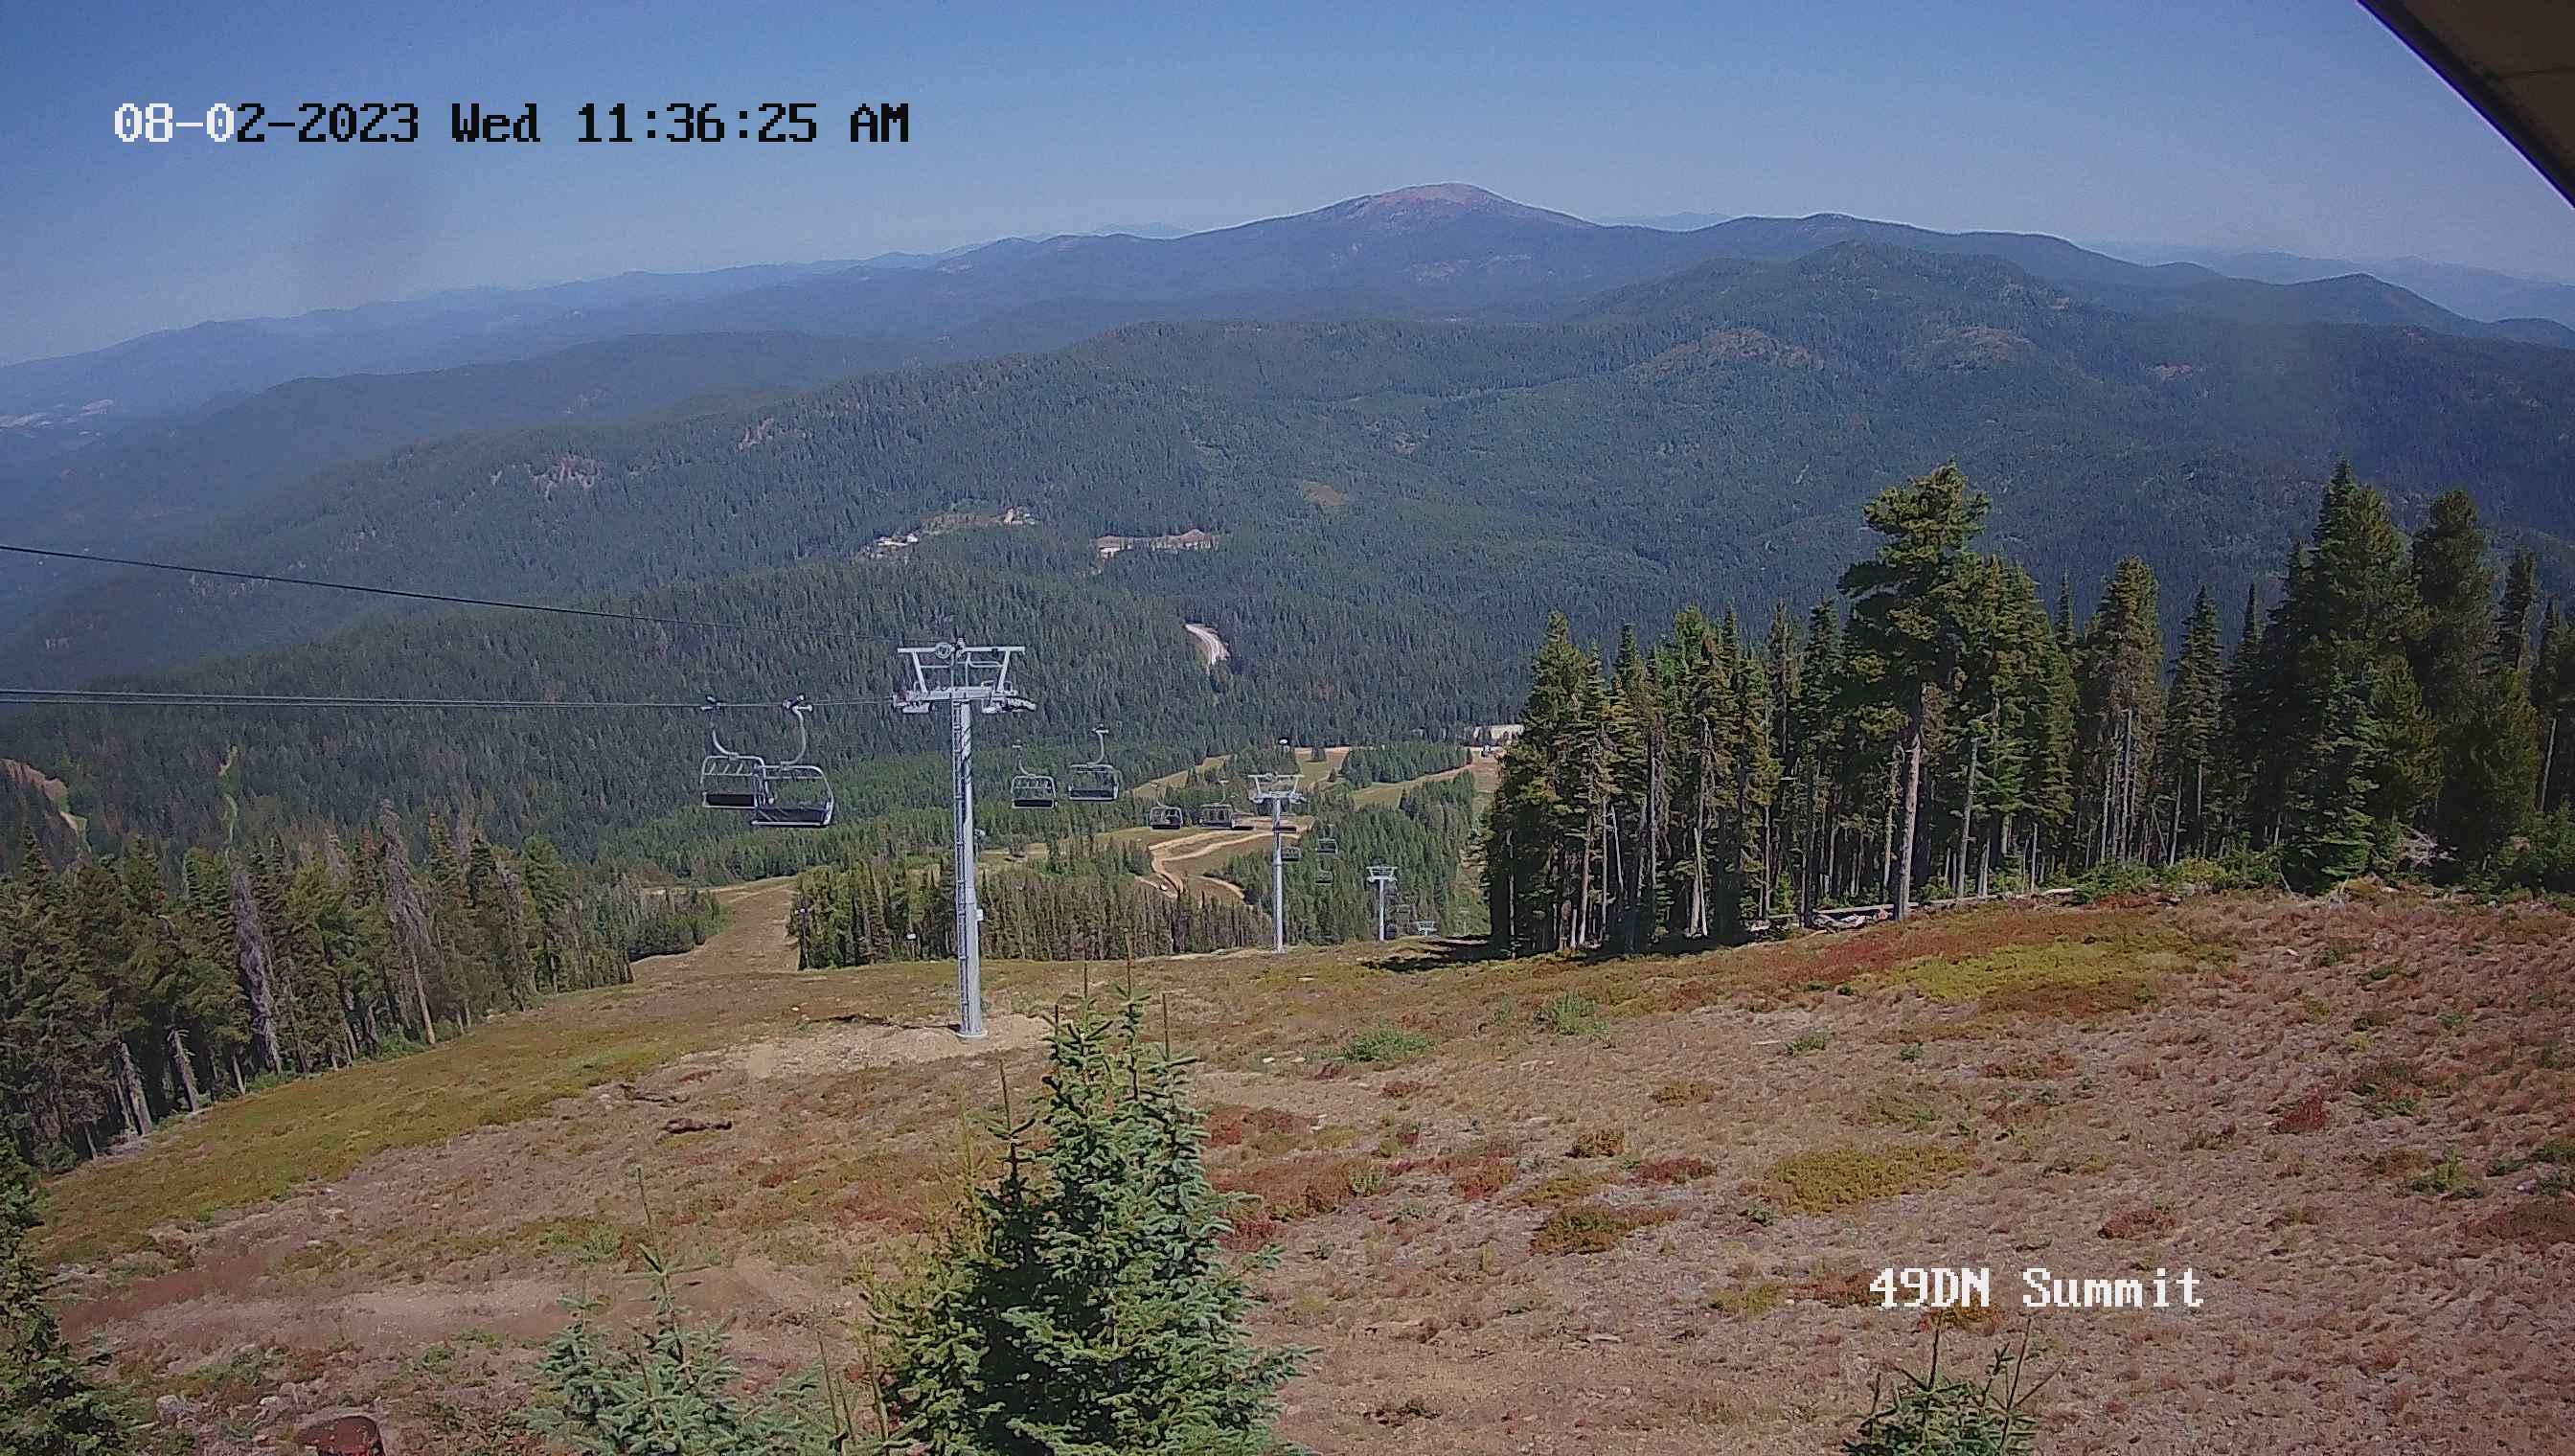 49 Degrees North Summit Cam is Offline